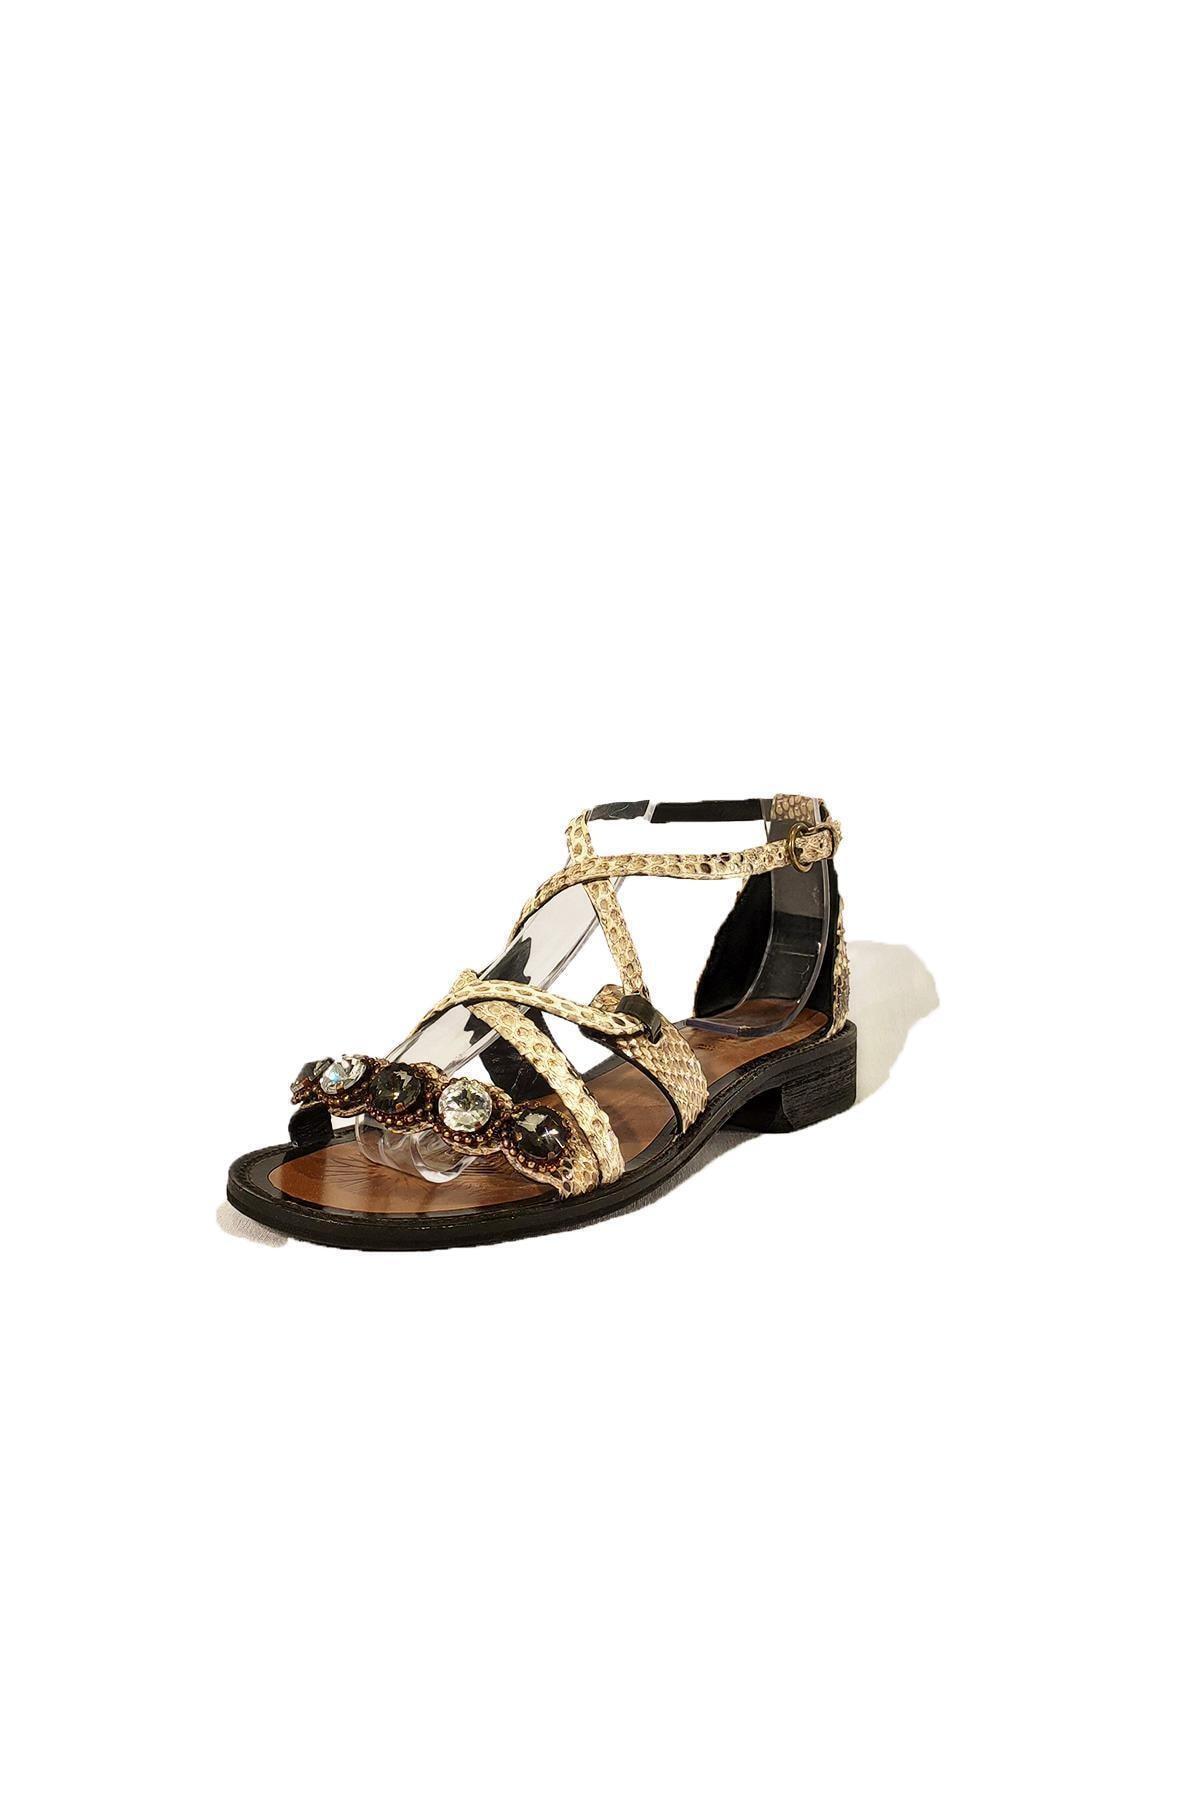 Nursace Hakiki Deri Sandalet Nsc19y-a08248 1